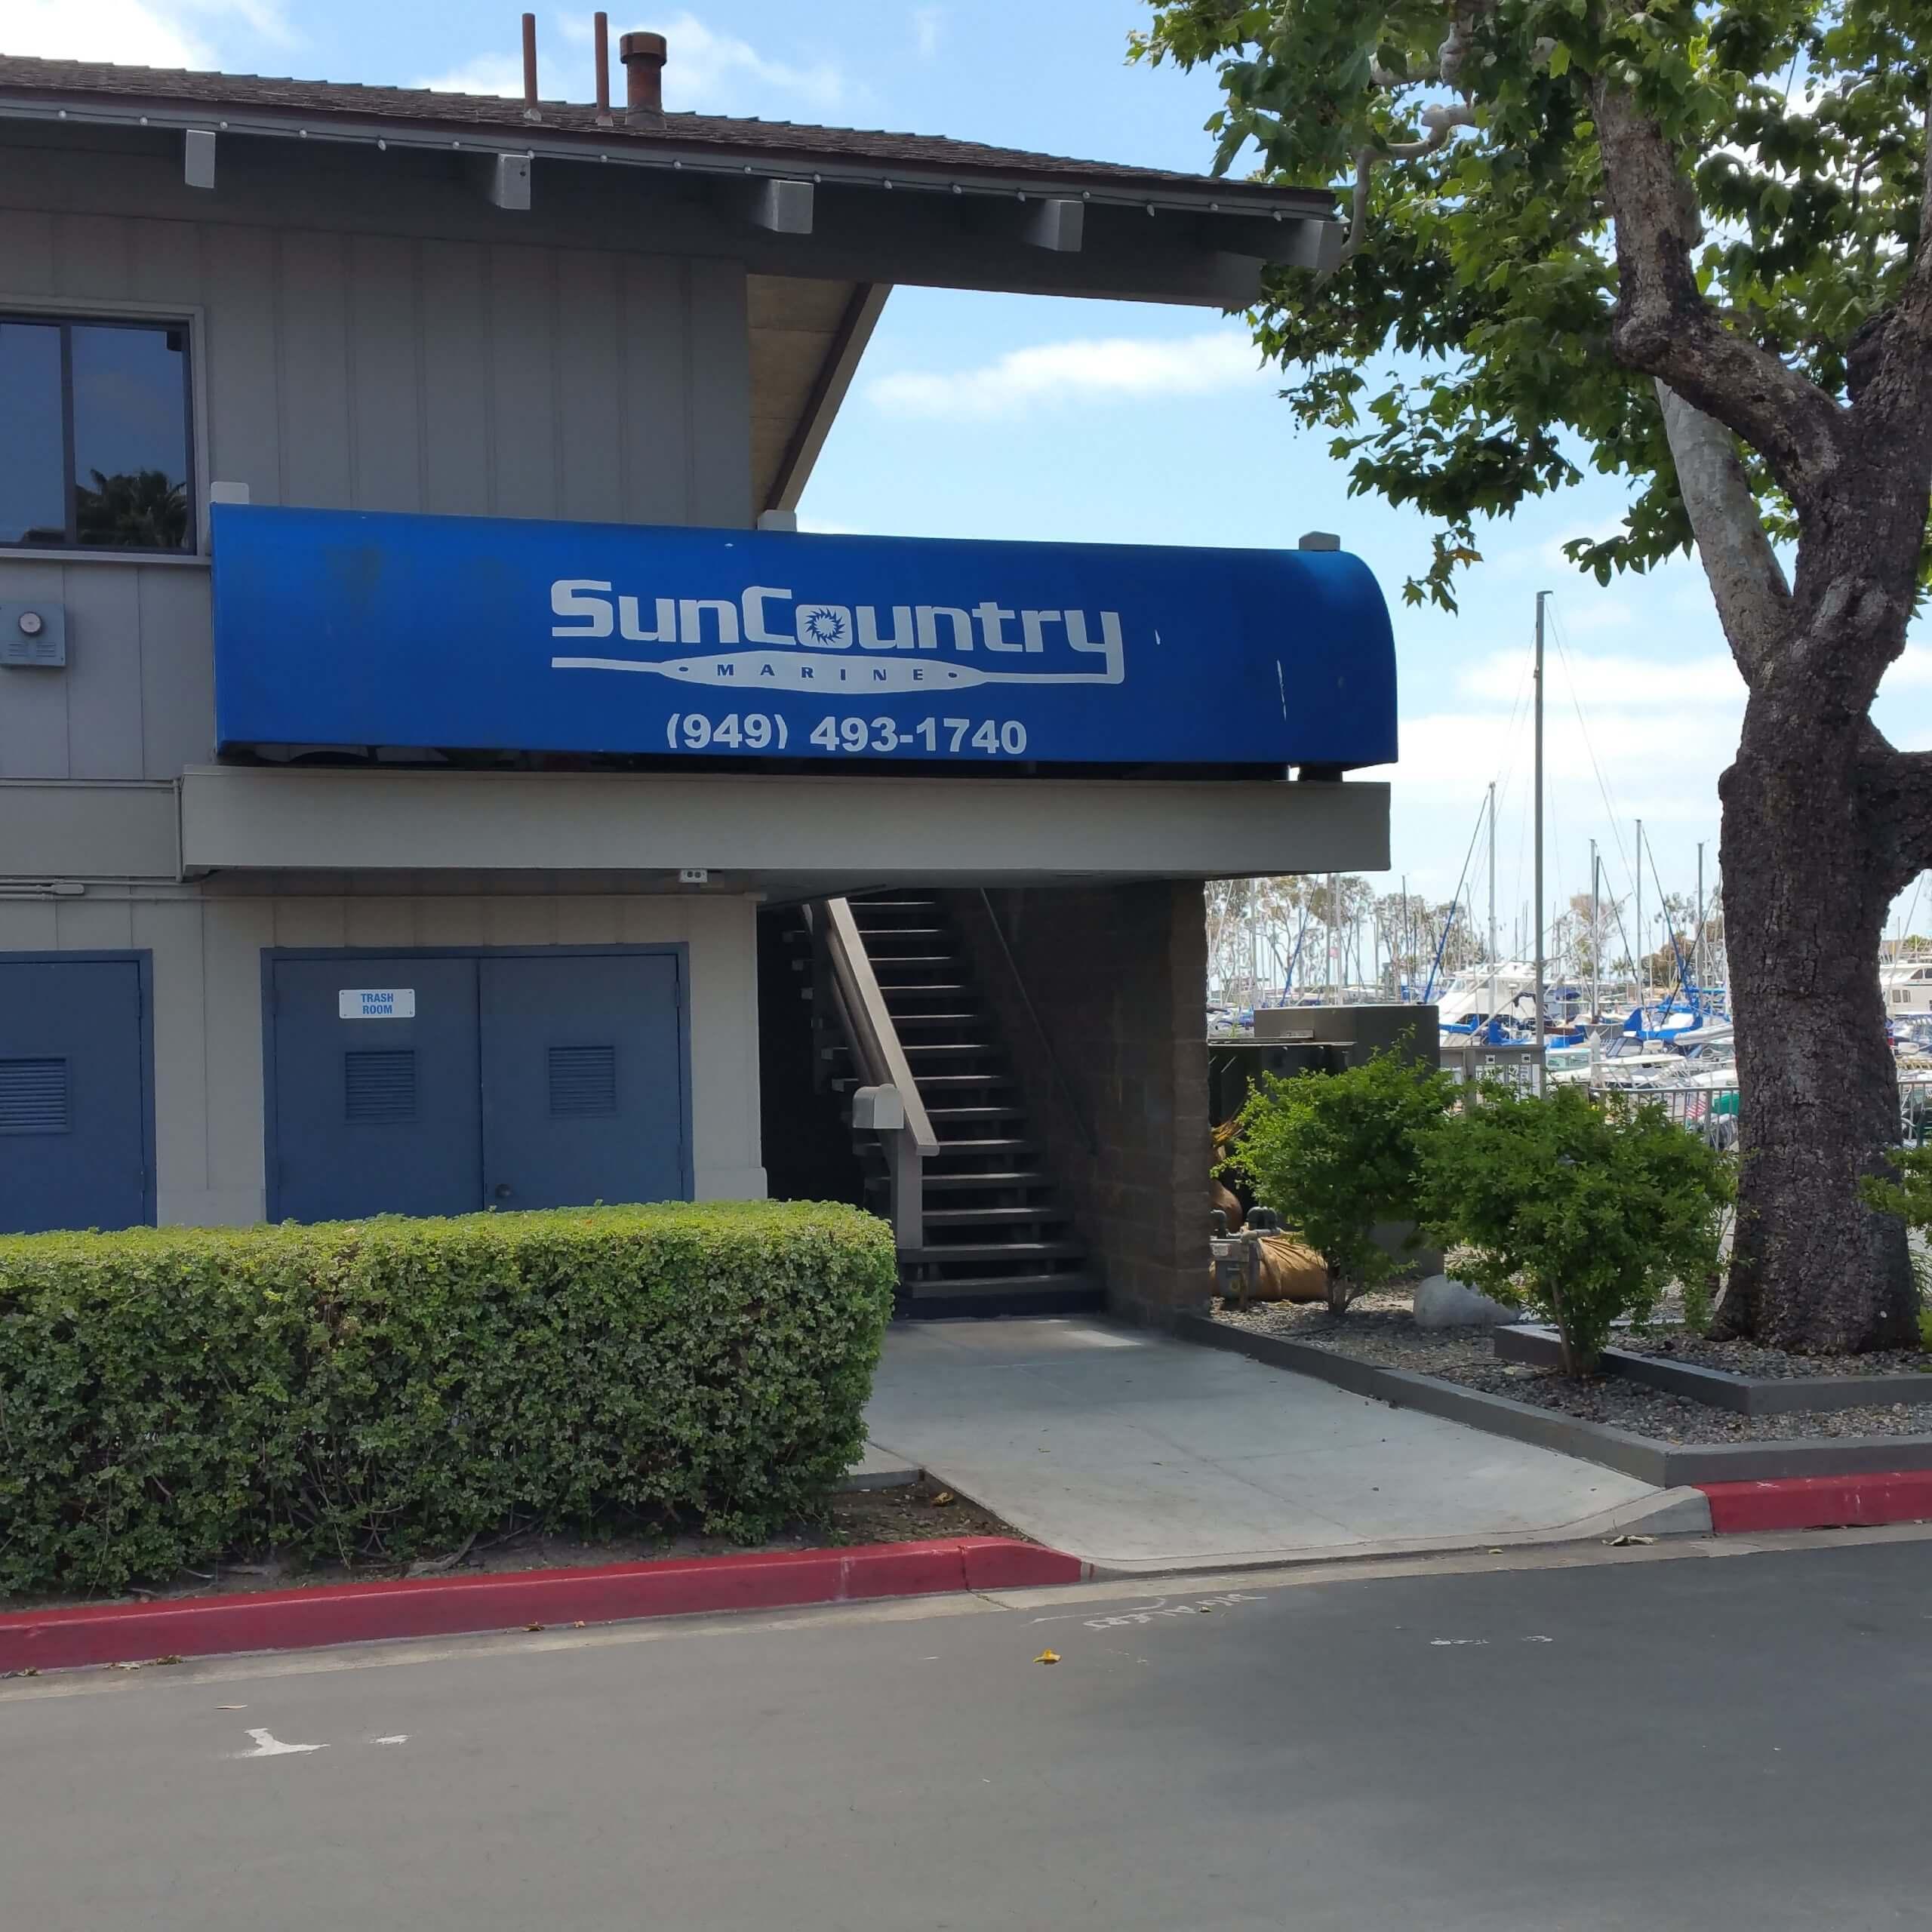 https://suncountrymarinegroup.com/wp-content/uploads/2020/06/sun_country_coastal-dana_point-storefront-scaled.jpg